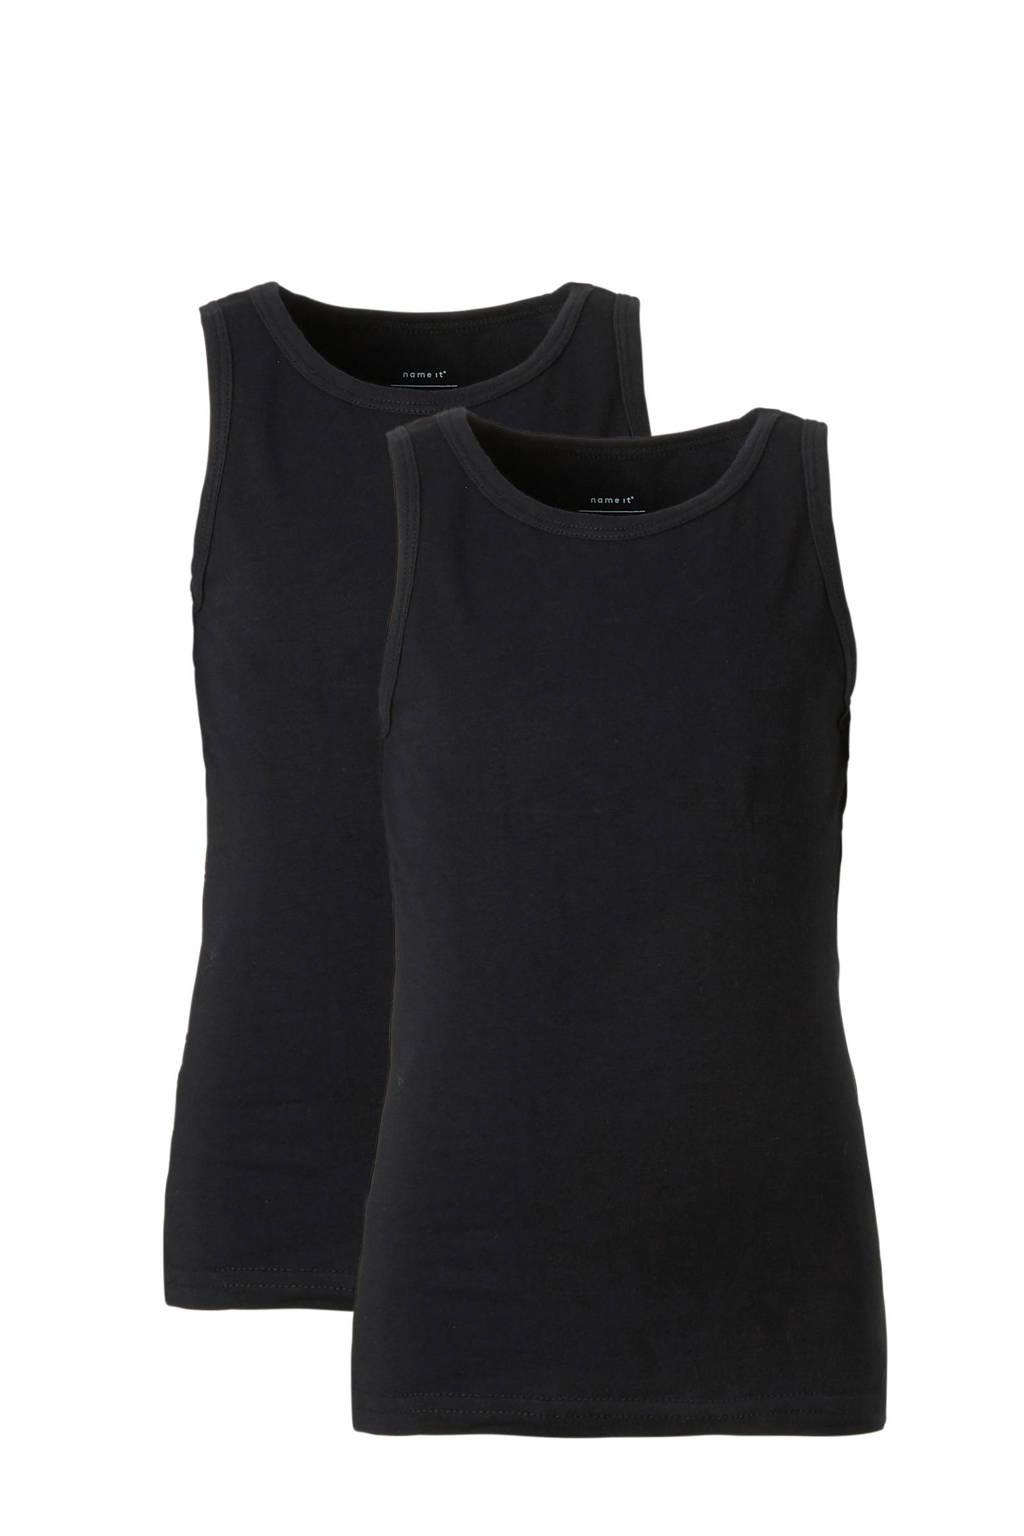 NAME IT MINI hemd zwart - set van 2, Zwart